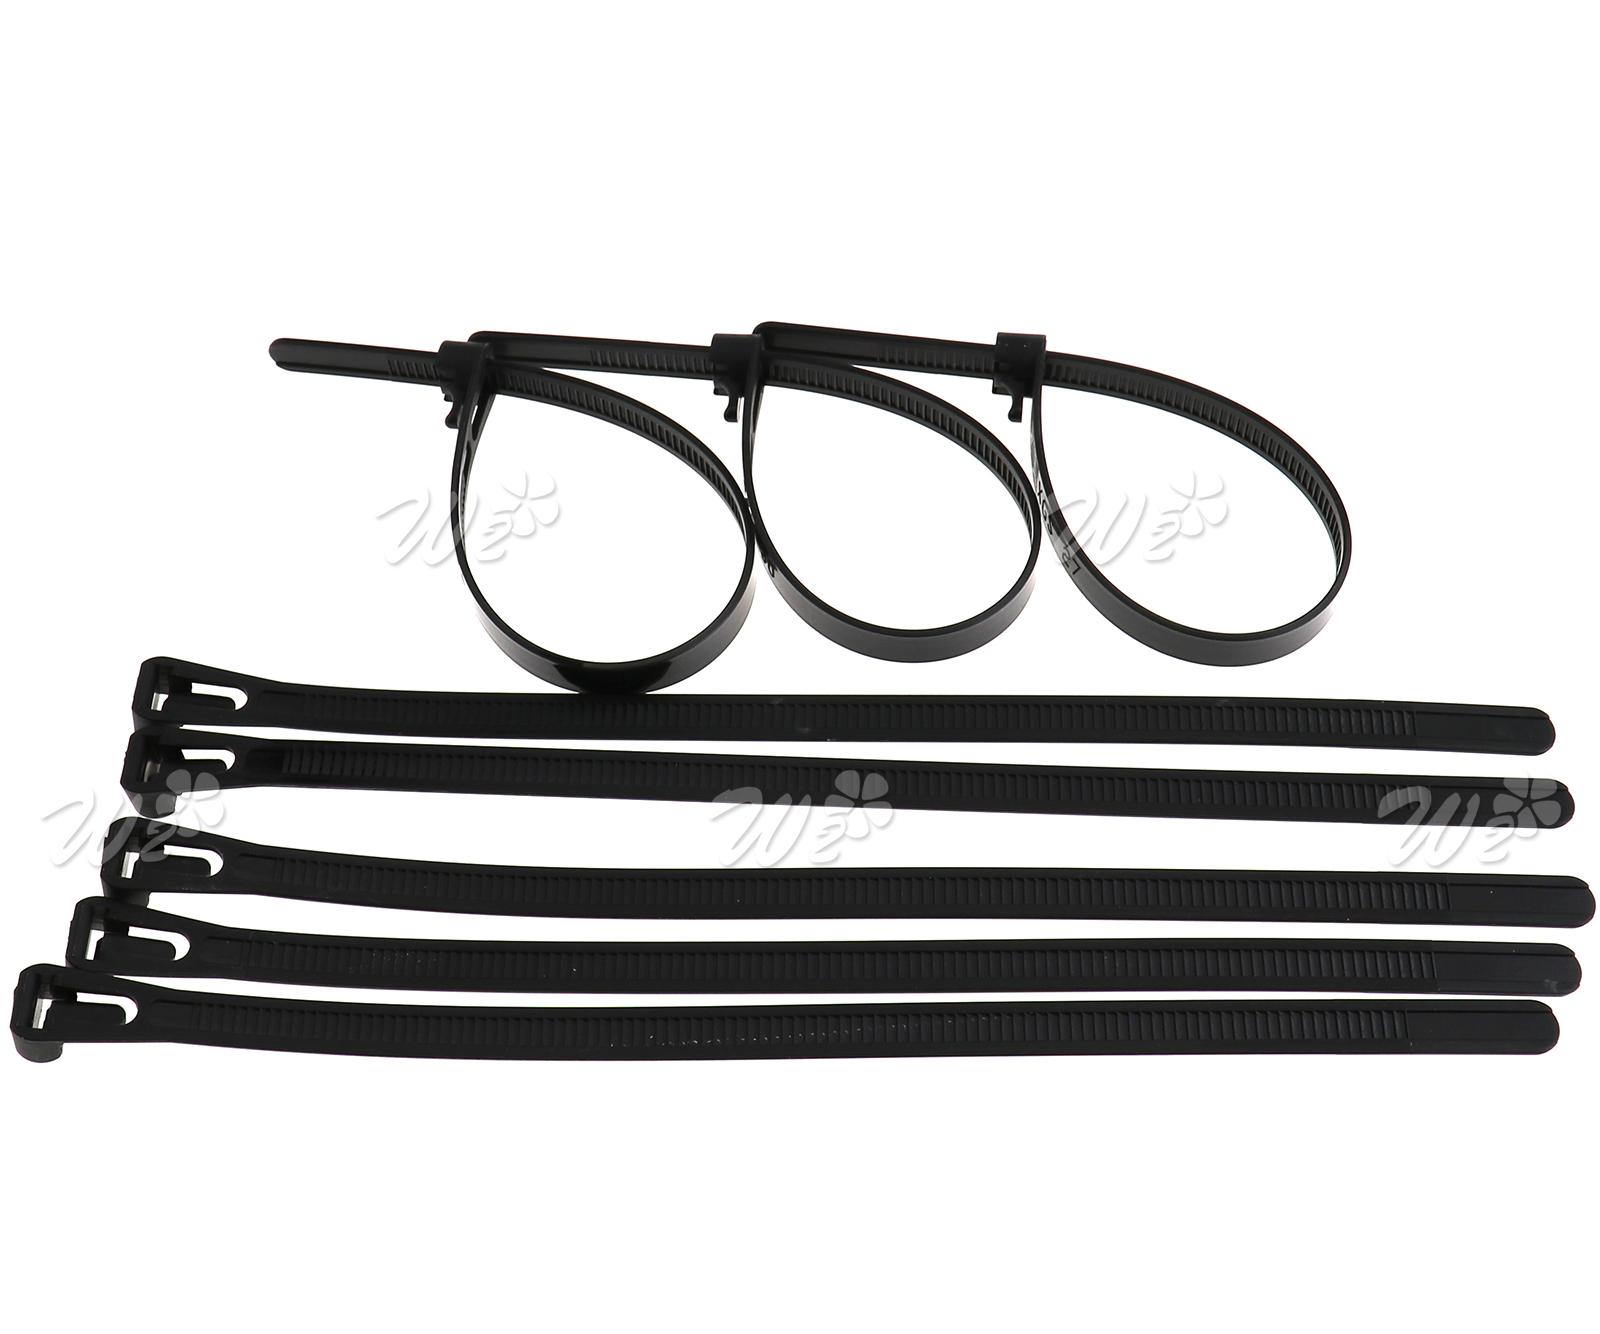 100x 8 X200 mm lösbare Kabelbinder Sortiment Schwarz kabel band ...